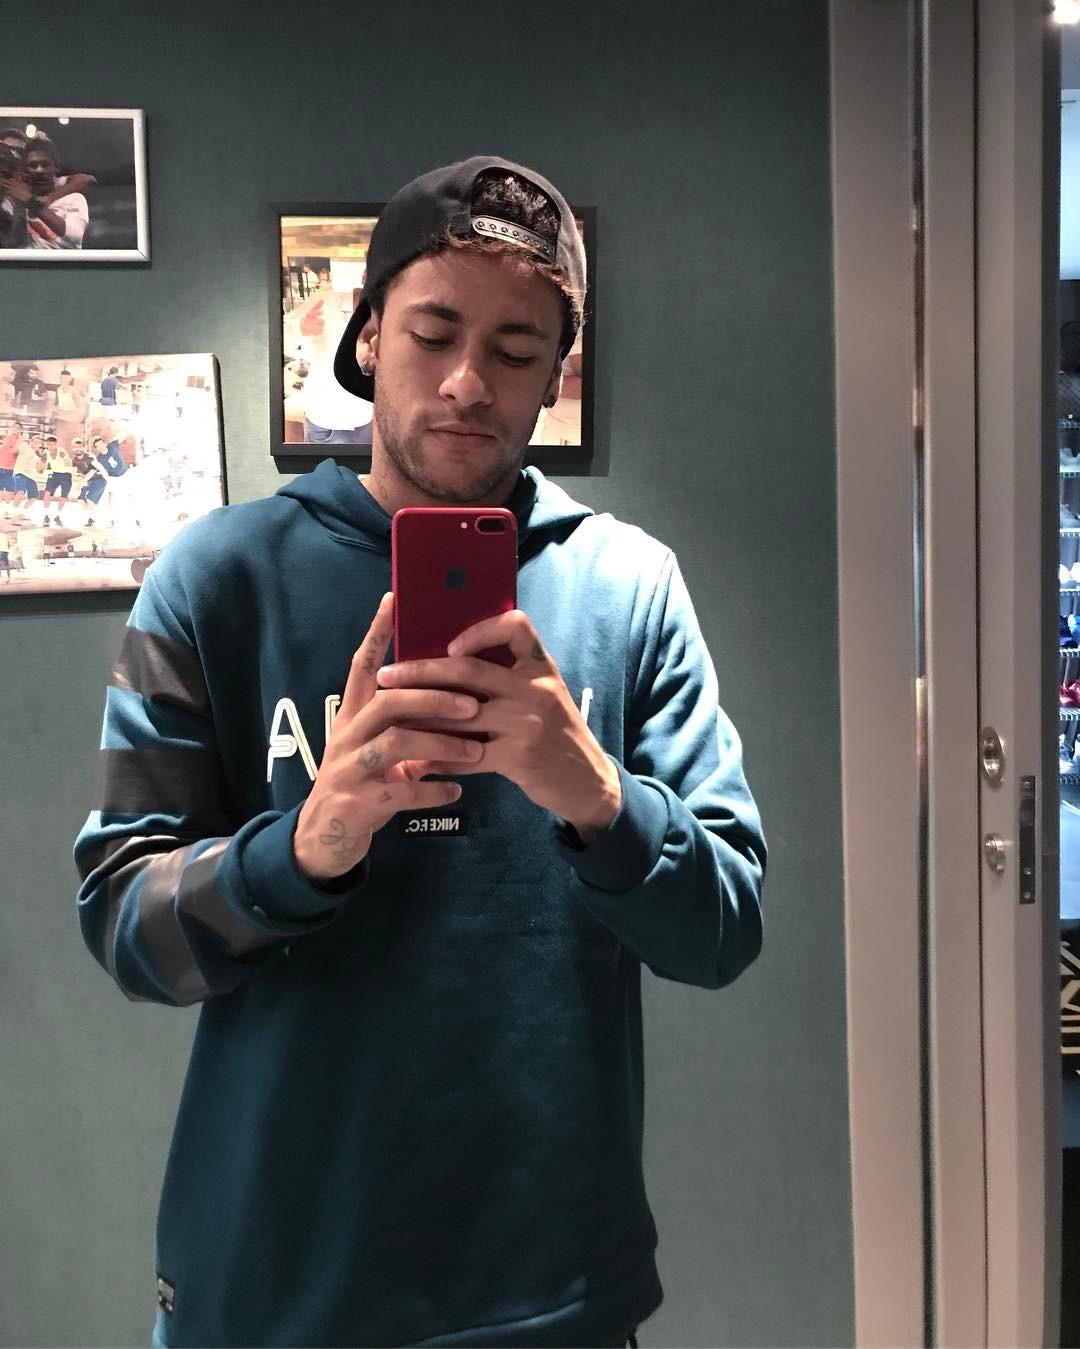 Footballer Naymar & Rafael Nadal | Rafa Nadal...Tennis is my Sport |  Pinterest | Barcelona, Instagram und Neymar